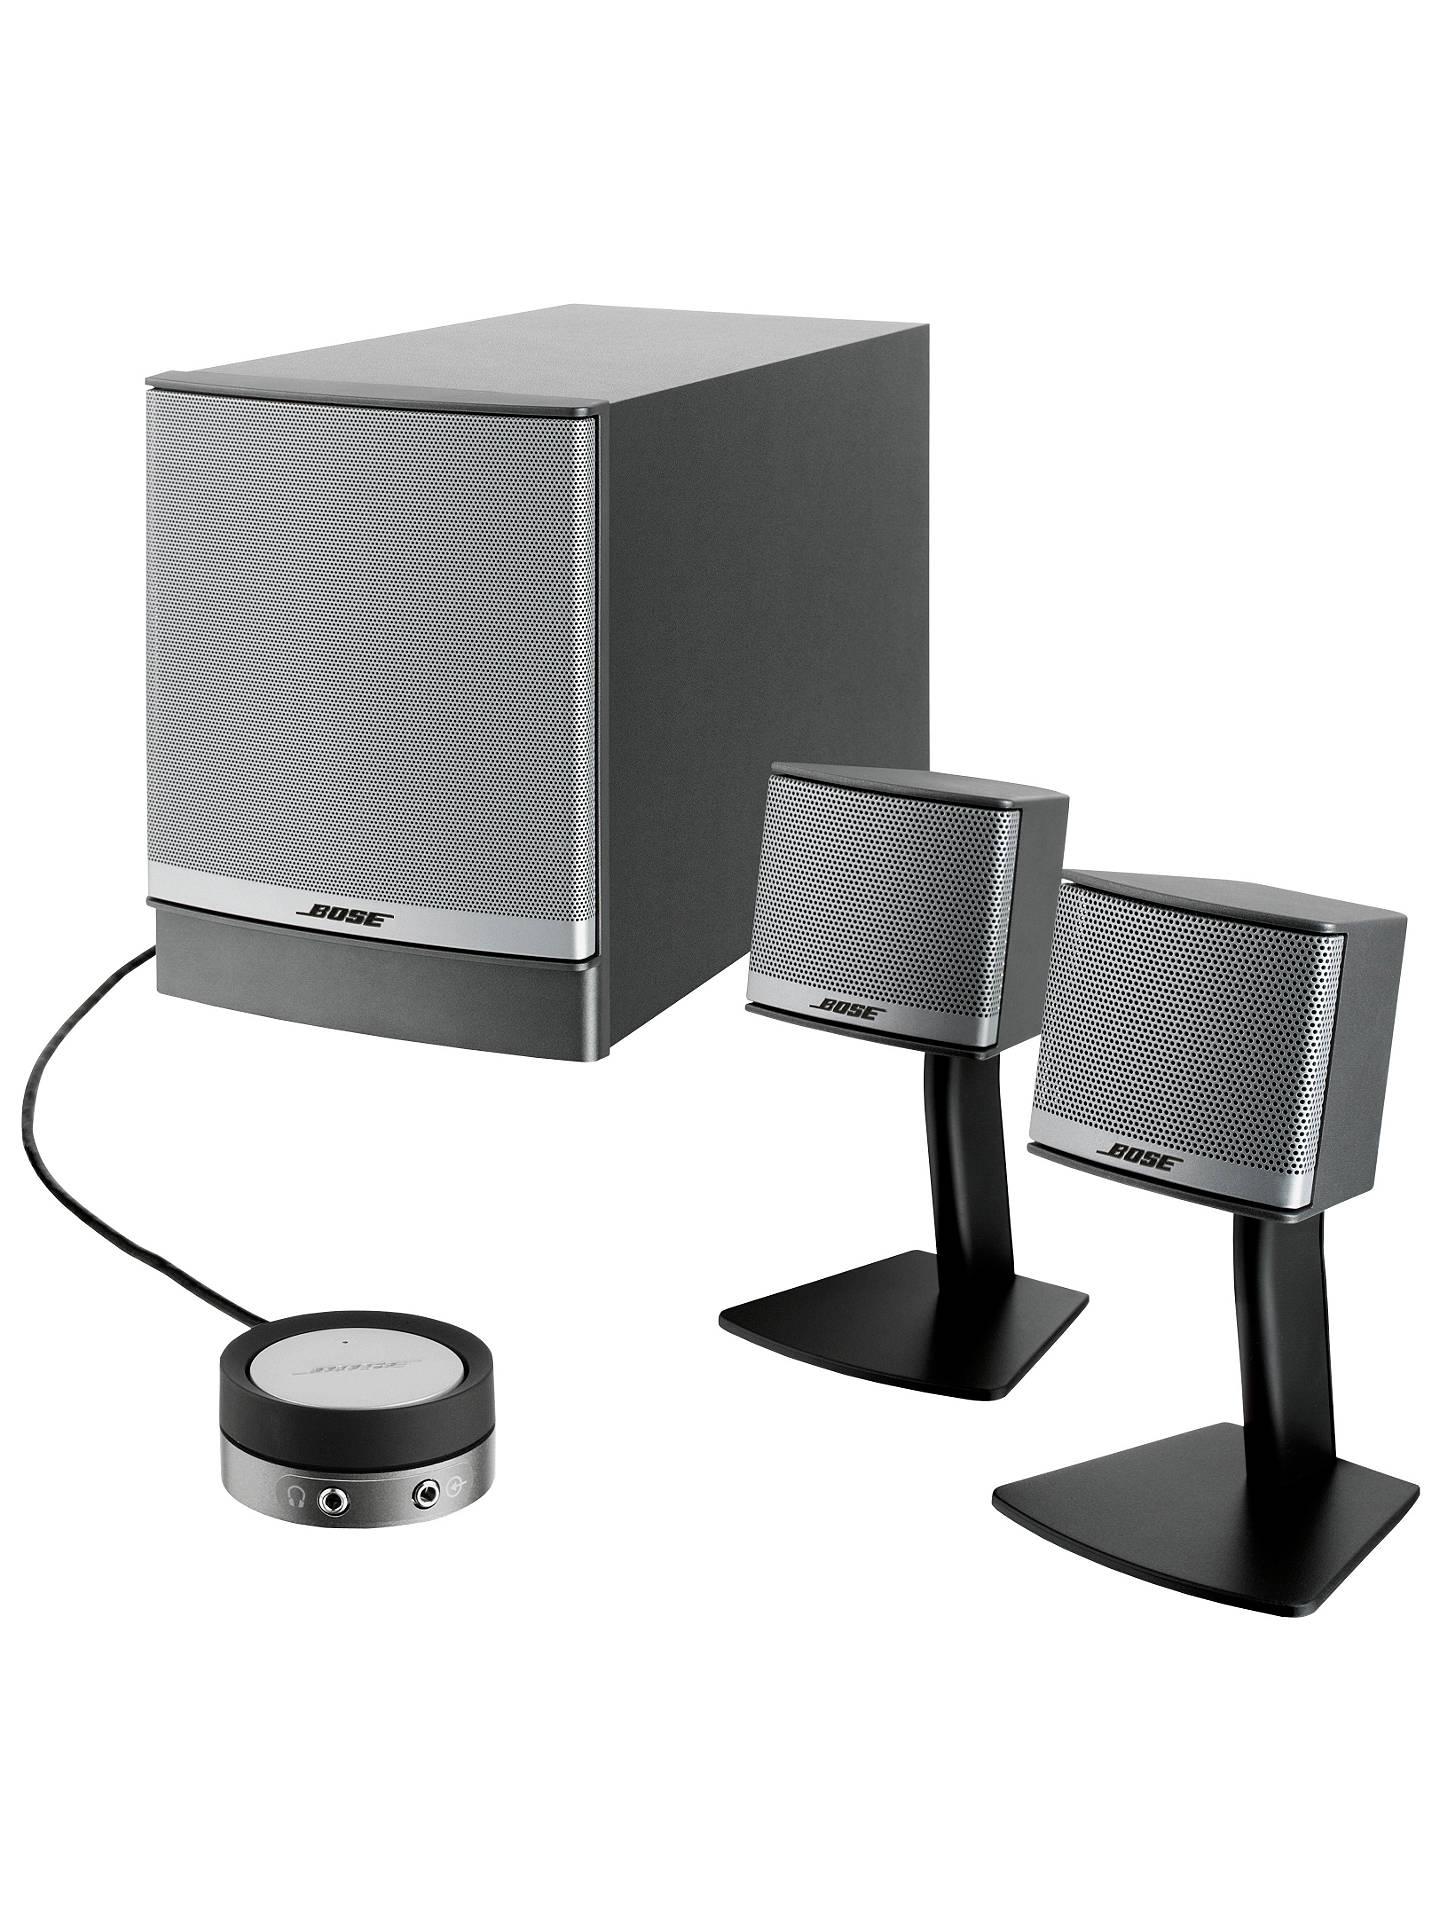 Bose U00ae Companion 3 Multimedia Speaker System At John Lewis